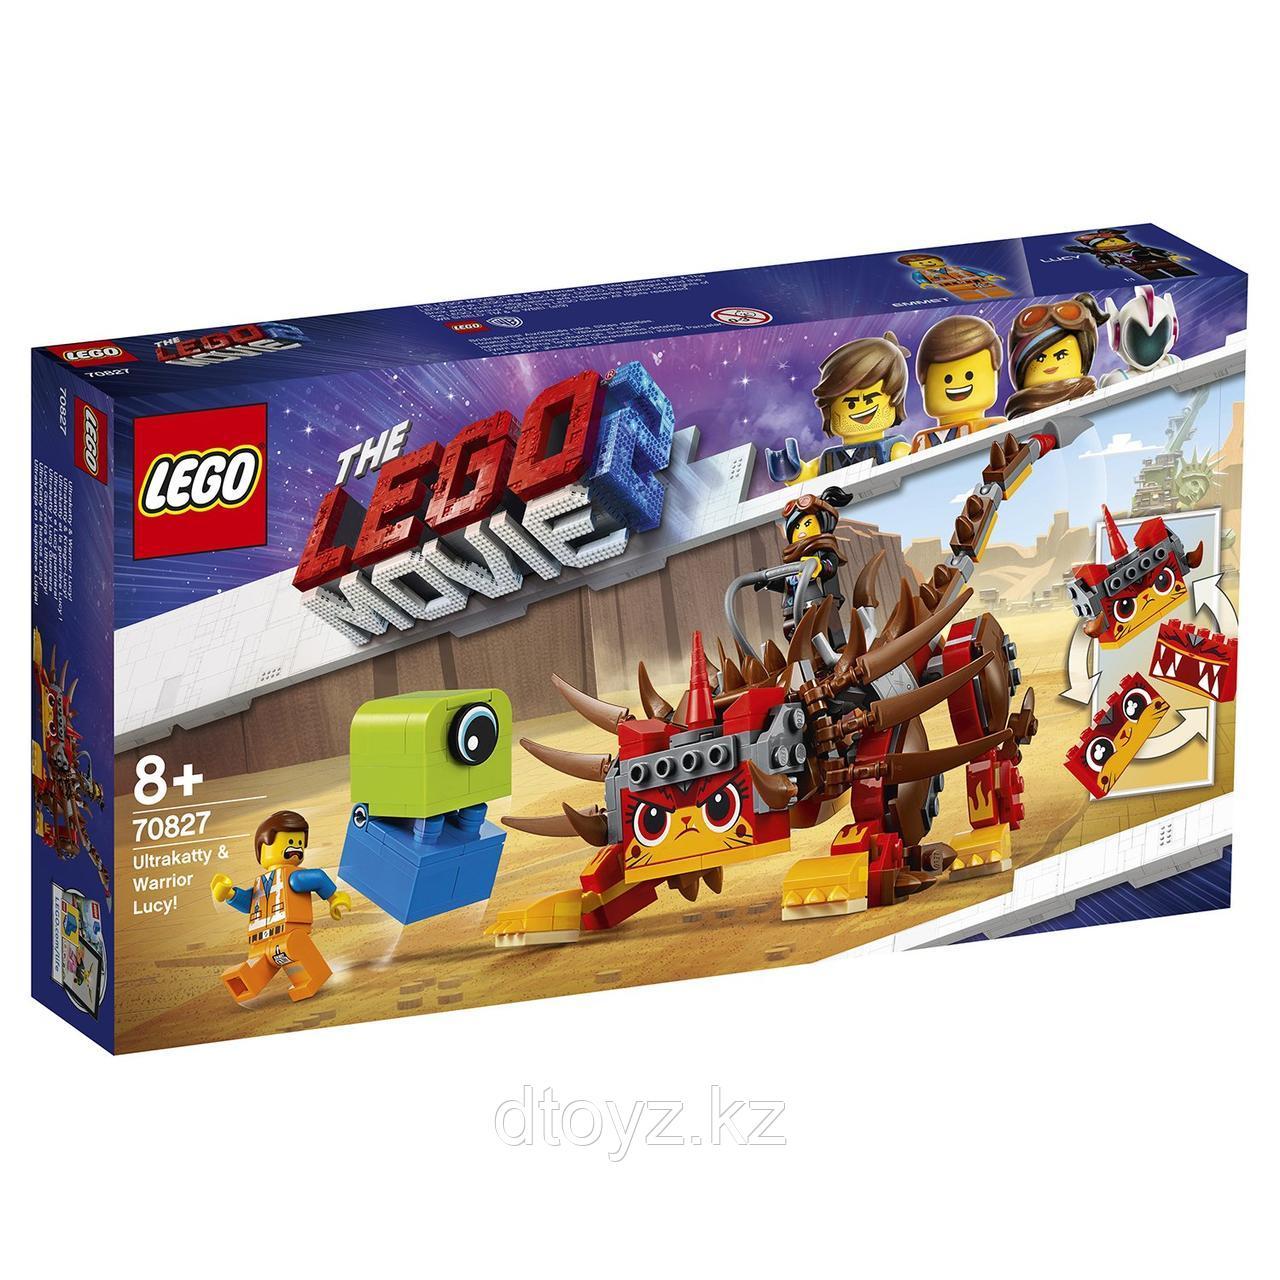 70827 LEGO Movie Ультра-Киса и воин Люси